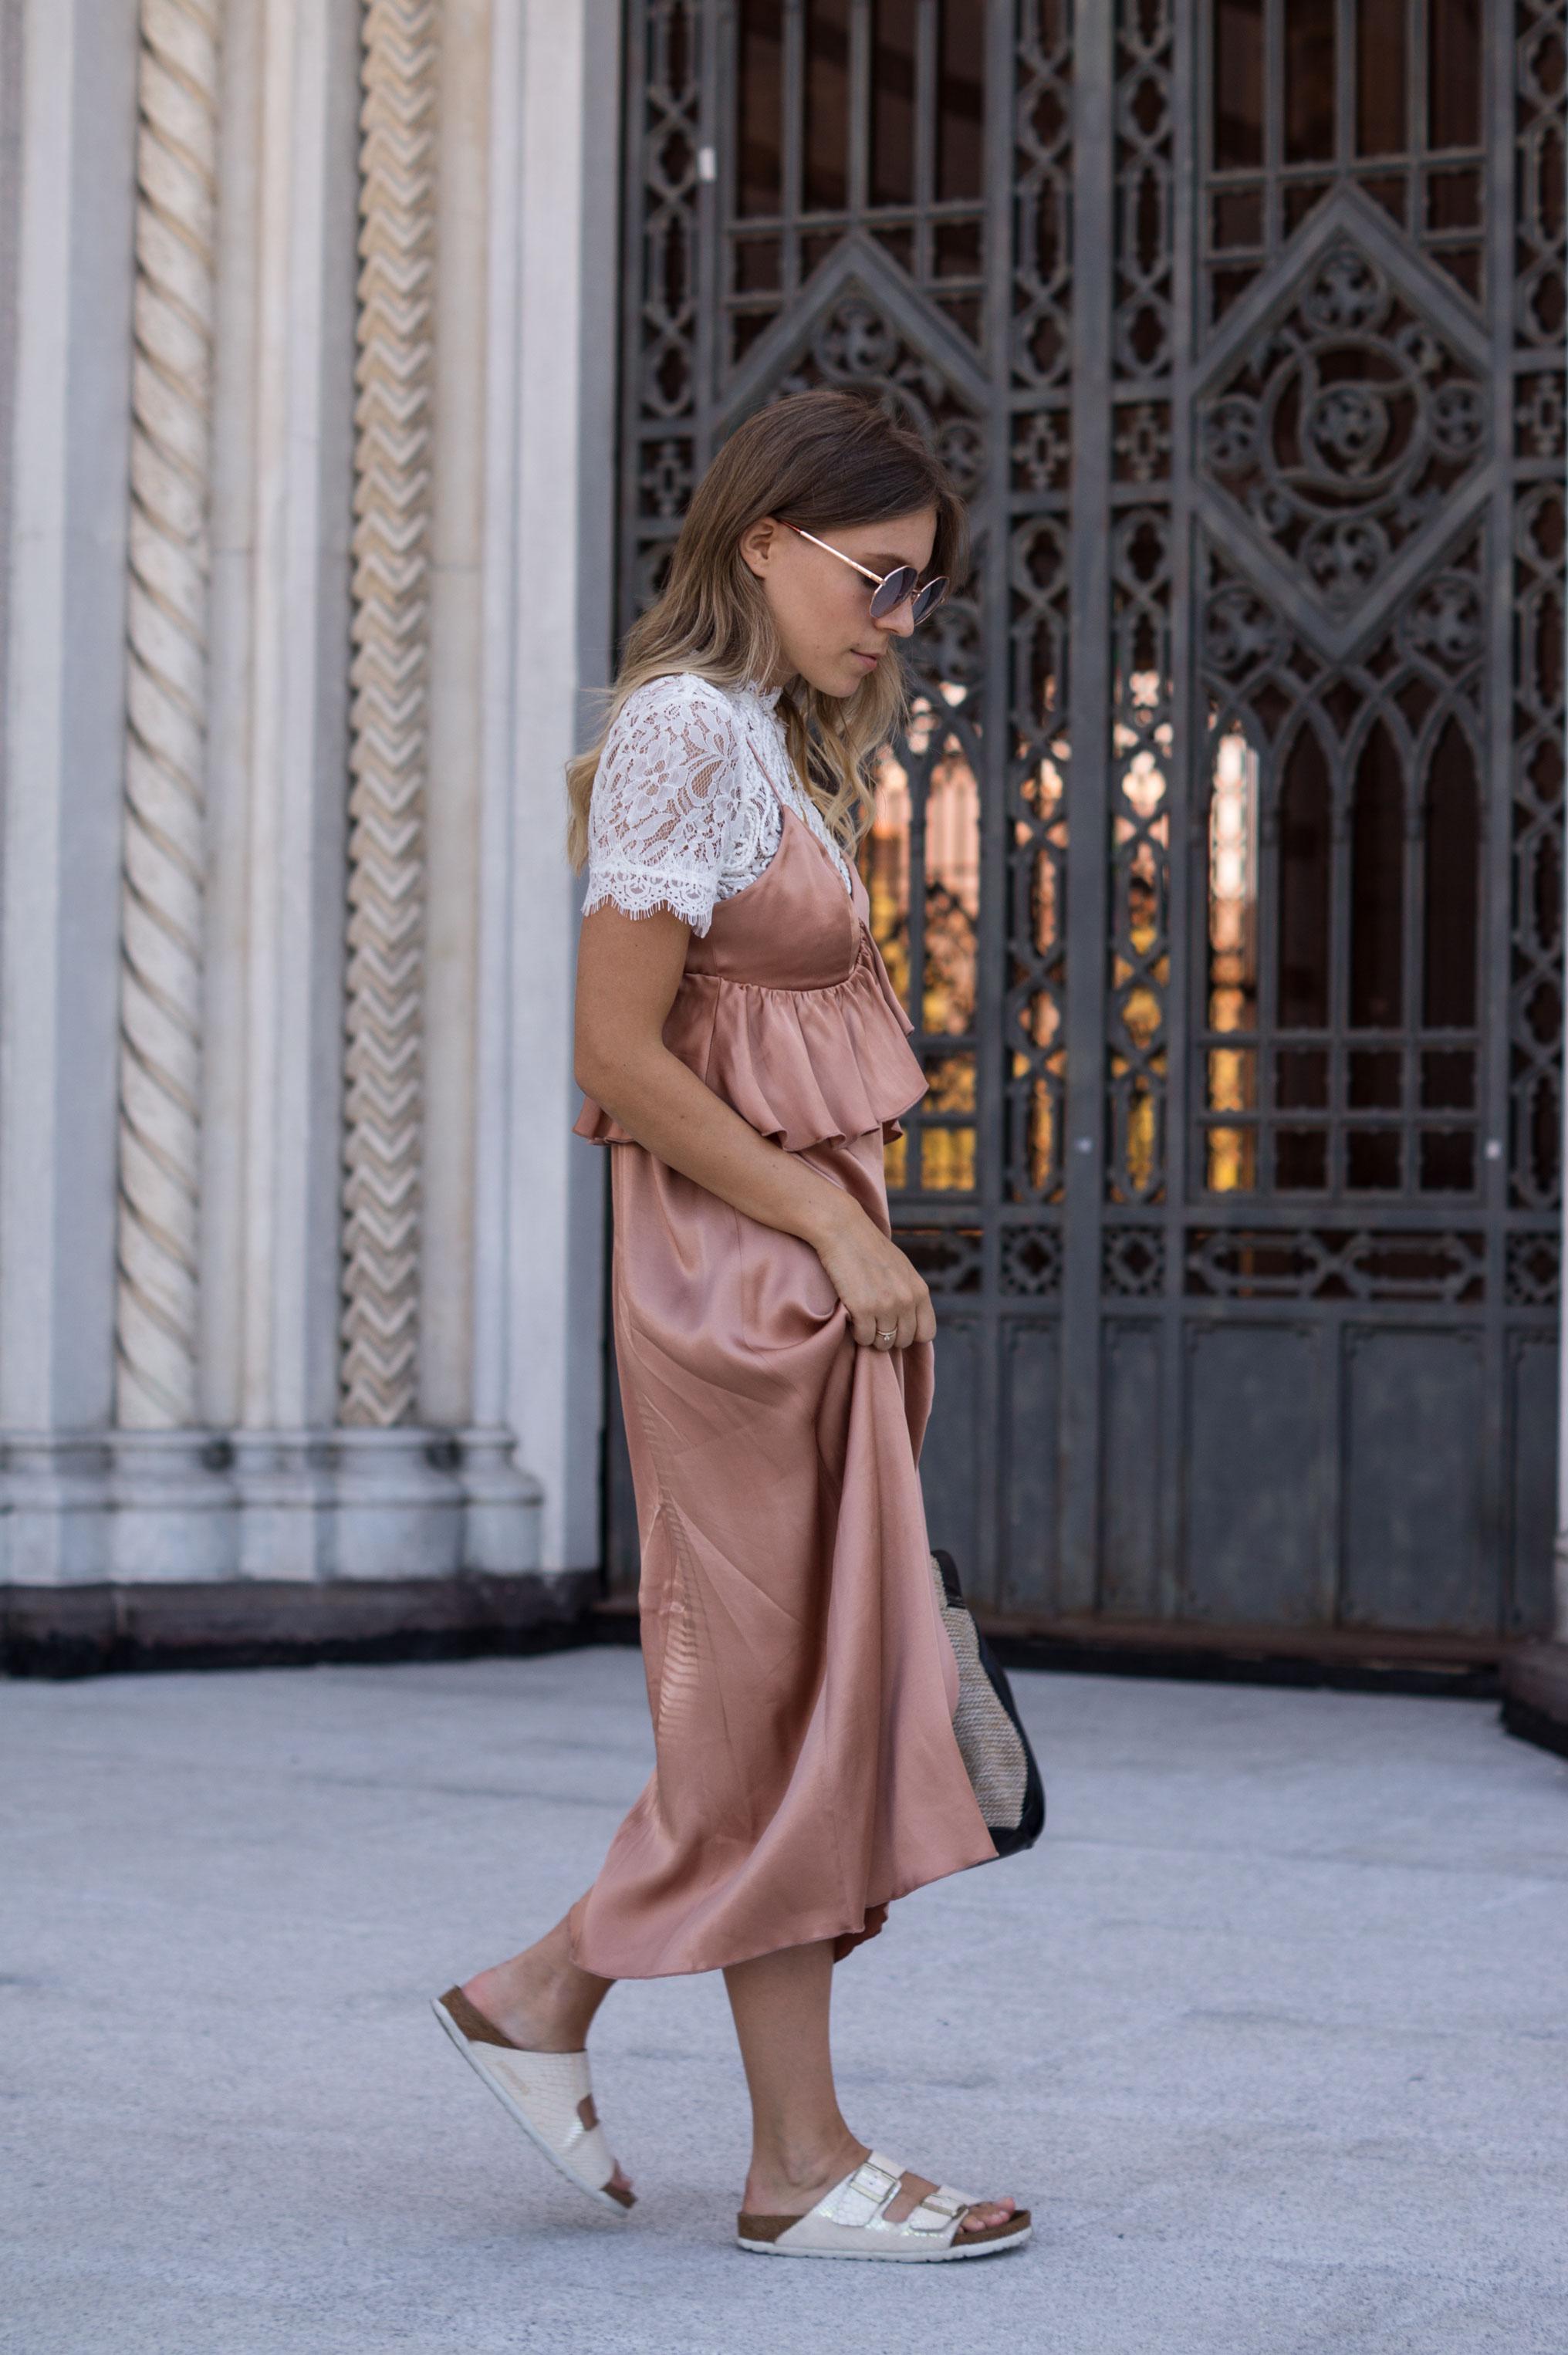 Copper Slipdress rosa Satinkleid silk dress ruffles Rüschenkleid H&M Sariety Modeblog Heidelberg Fashionblogger Milan Mailand Shooting-17